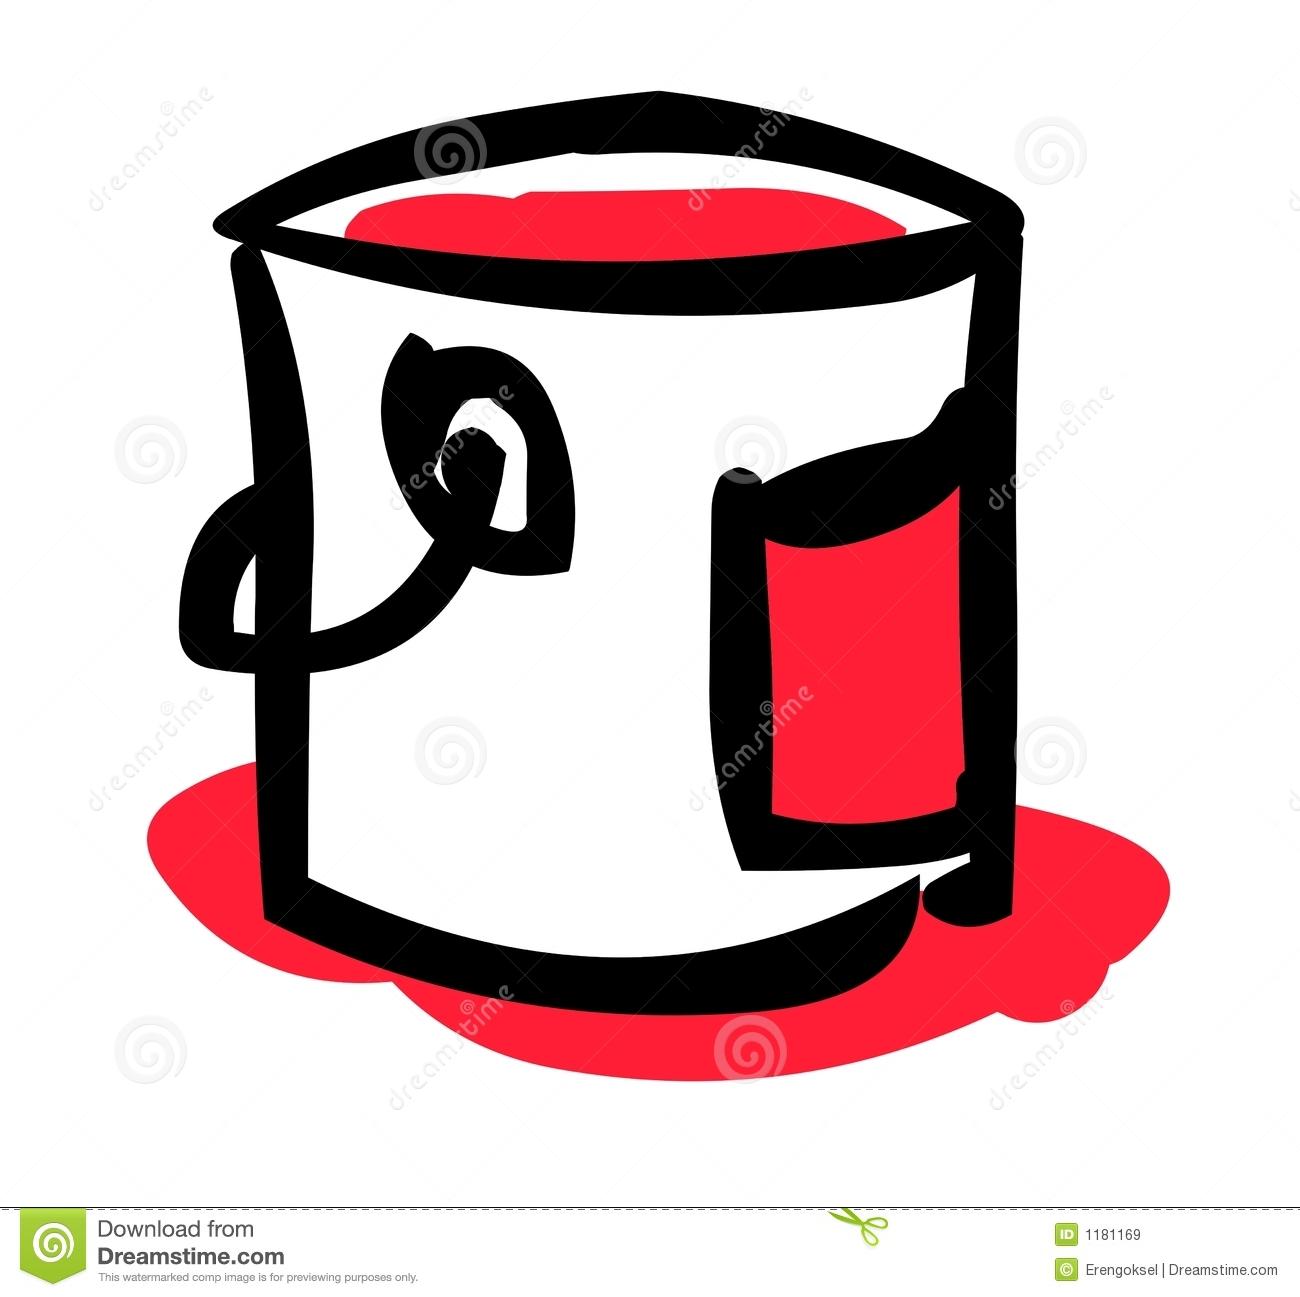 Bucket clipart paint bucket. Clip art panda free